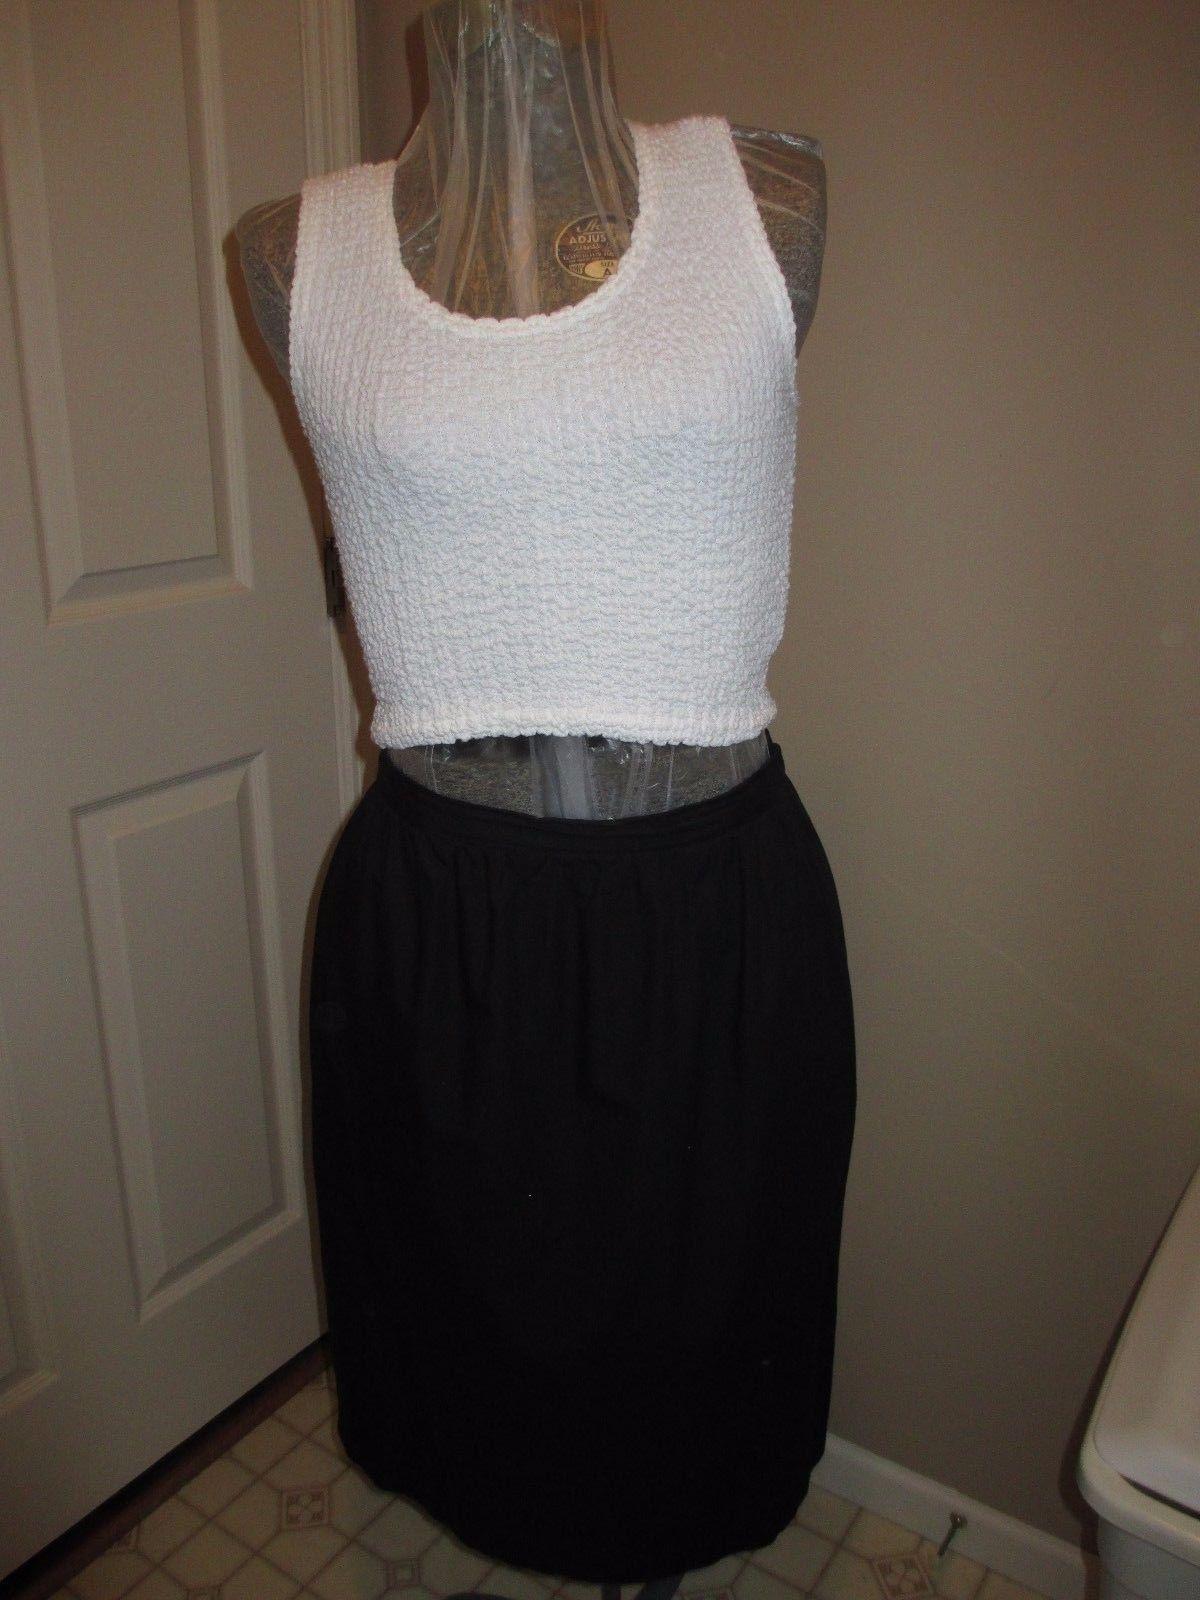 No Boundaries Stretch Camisole Medium White - $12.99